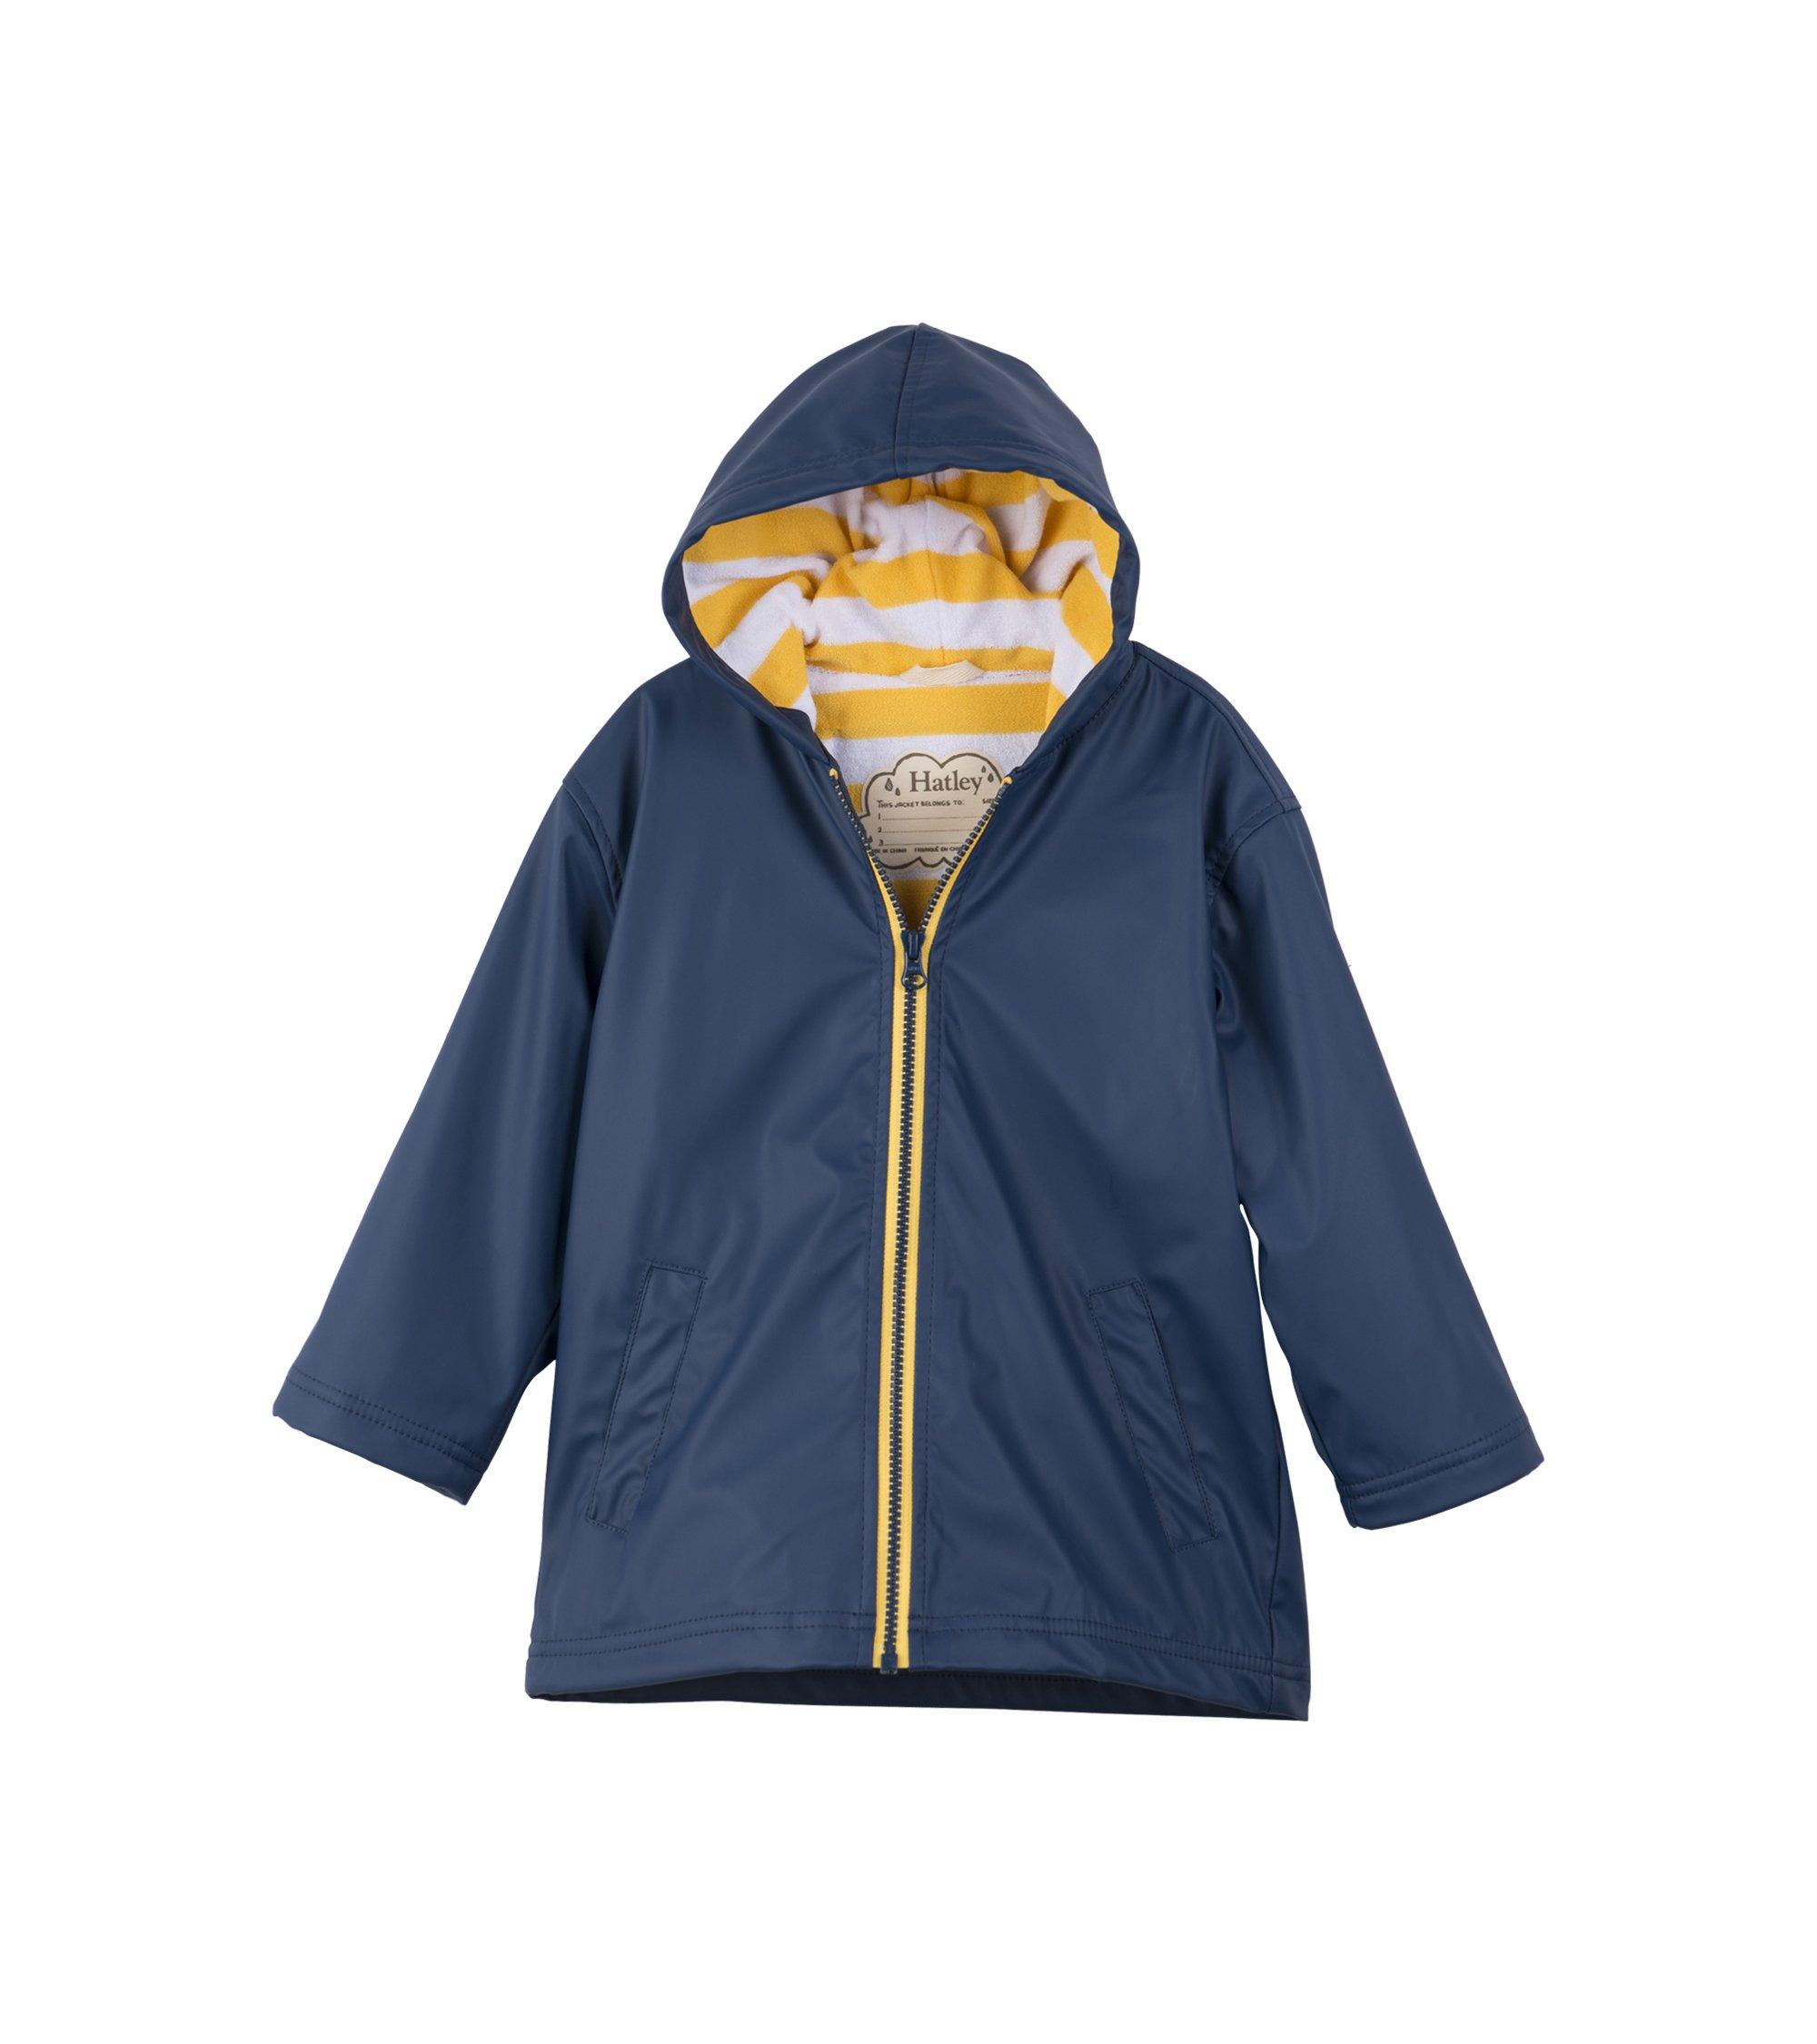 Hatley Boys' Little Splash Jacket, Navy/Yellow, 6 by Hatley